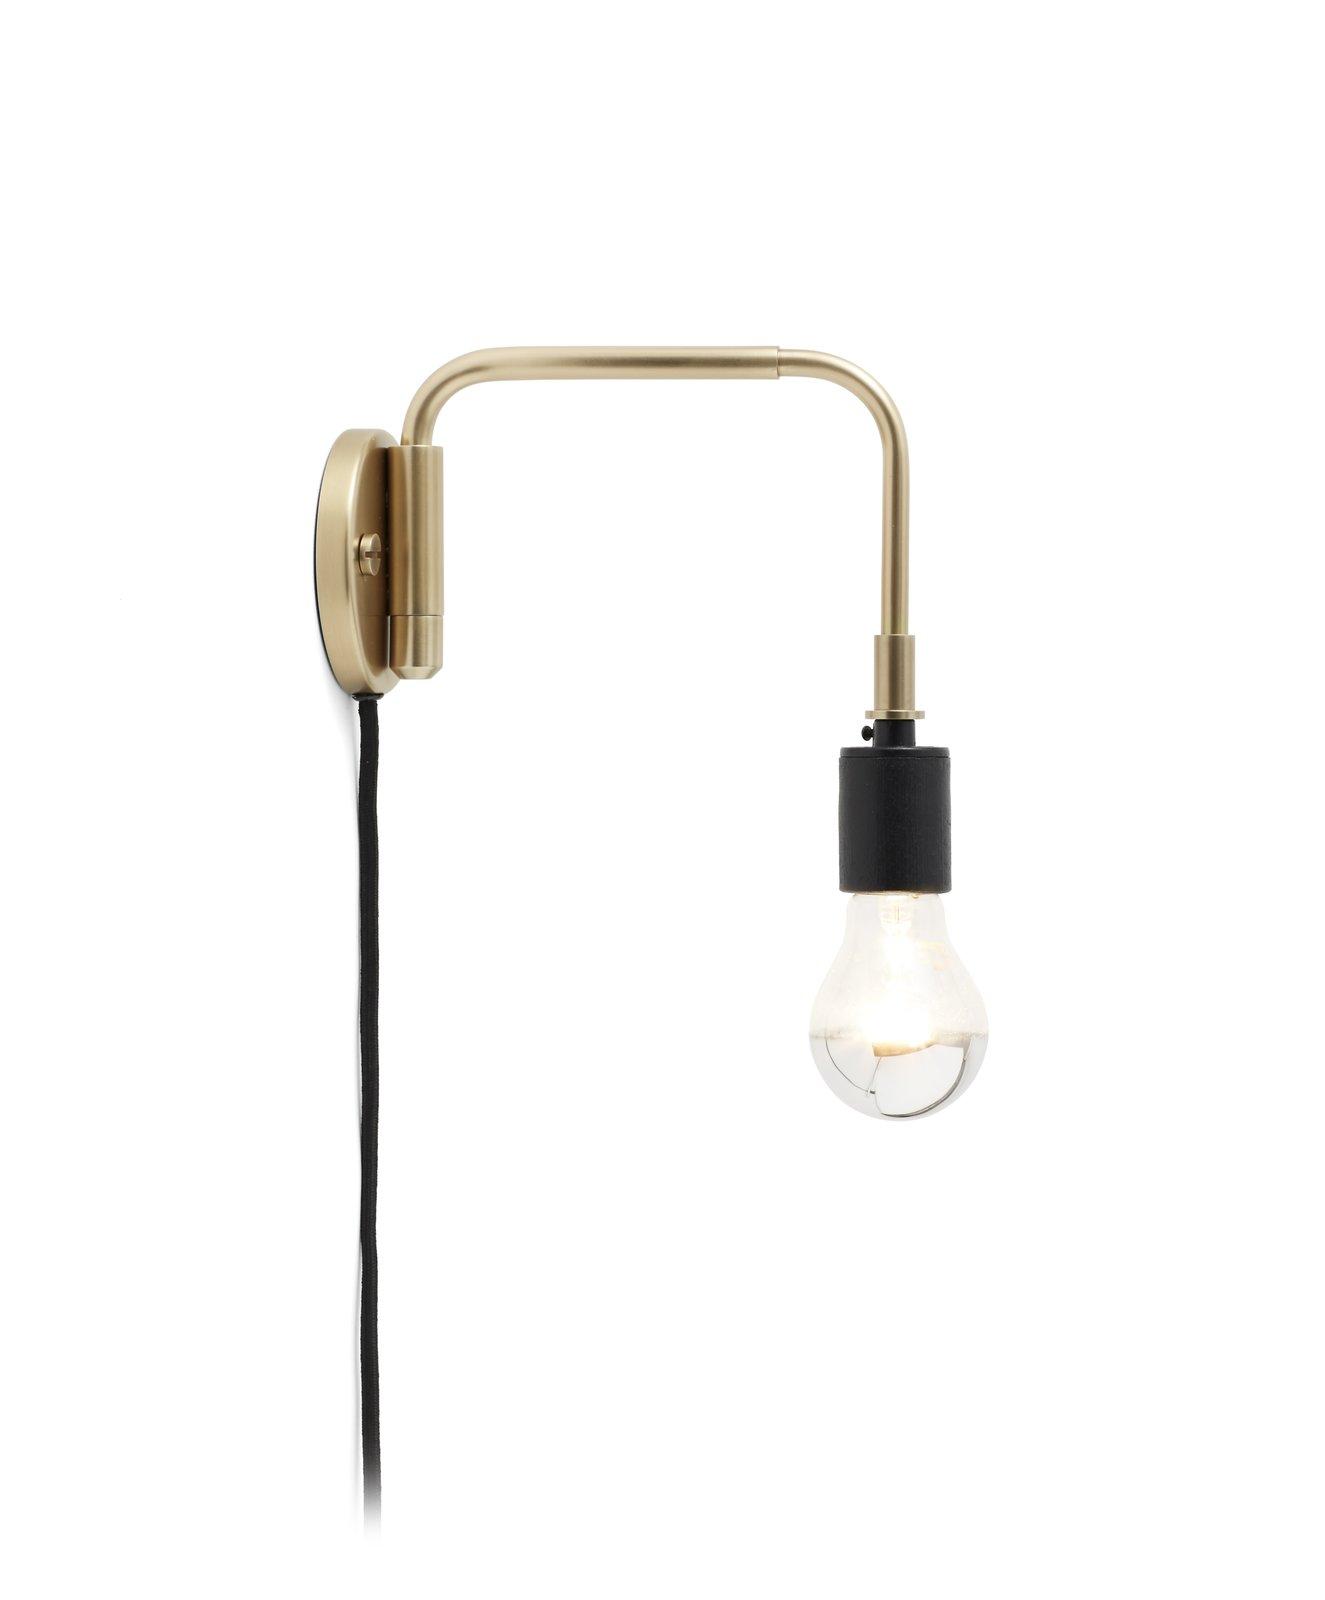 Staple Wall Lamp  Tribeca Series by Menu